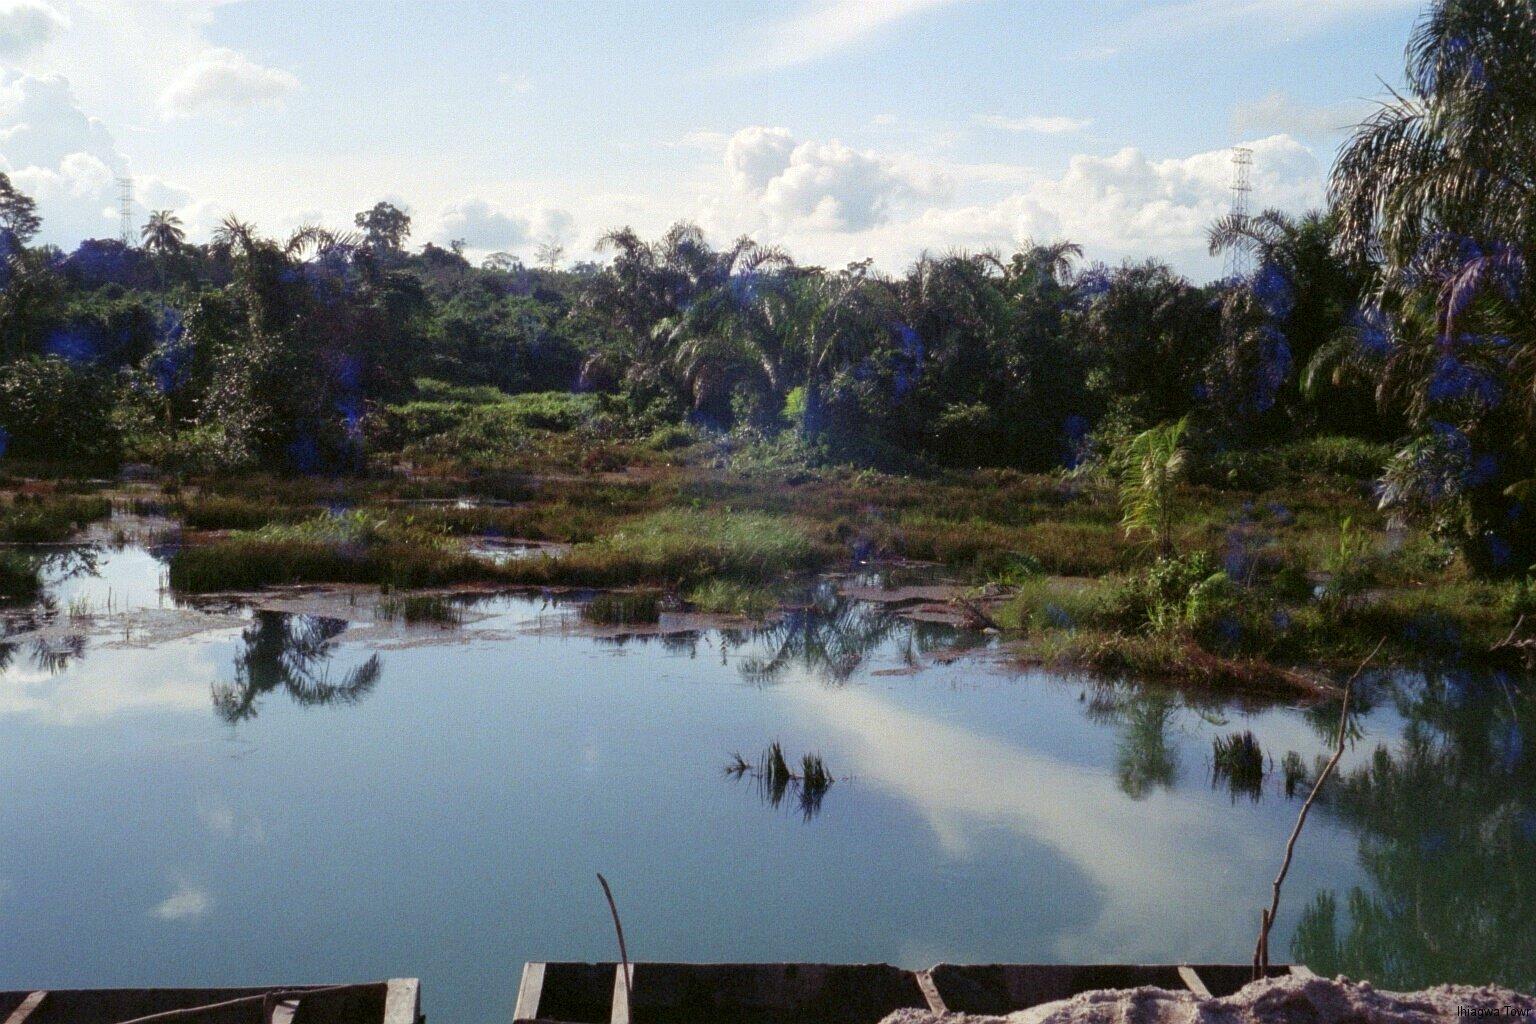 Imo Okays N49.9m to Rehabilitate Otamiri Water Plant